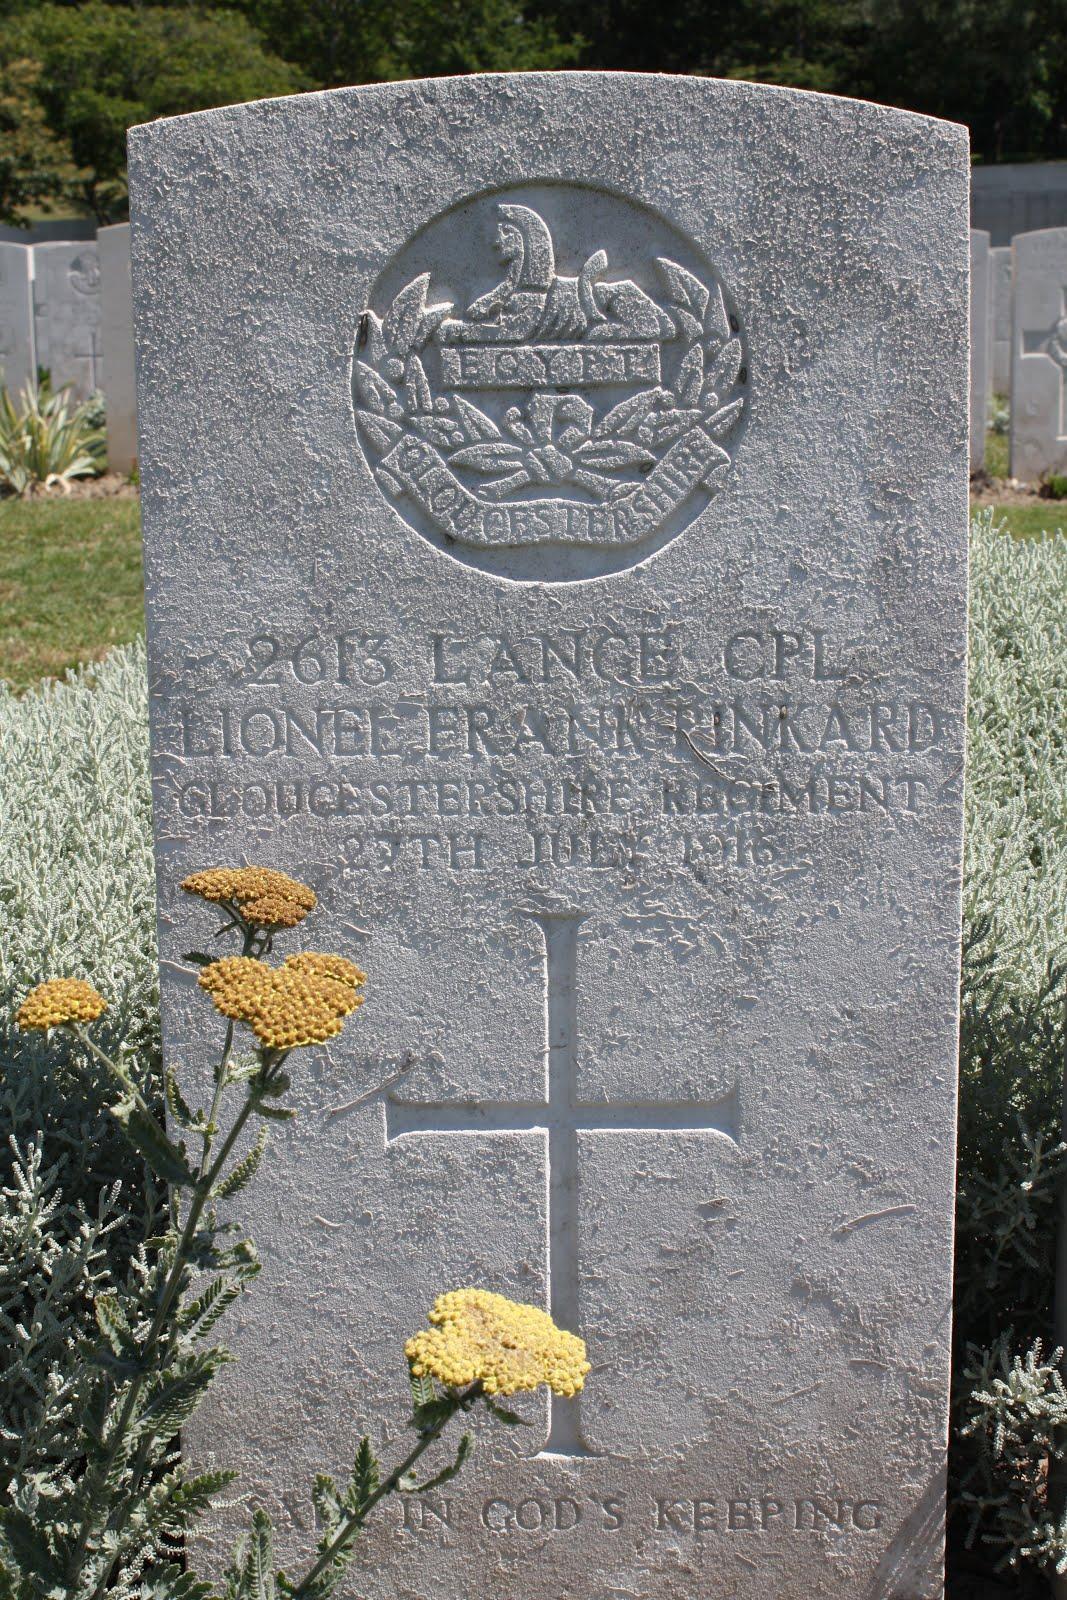 WWI Cemetery, Etaples